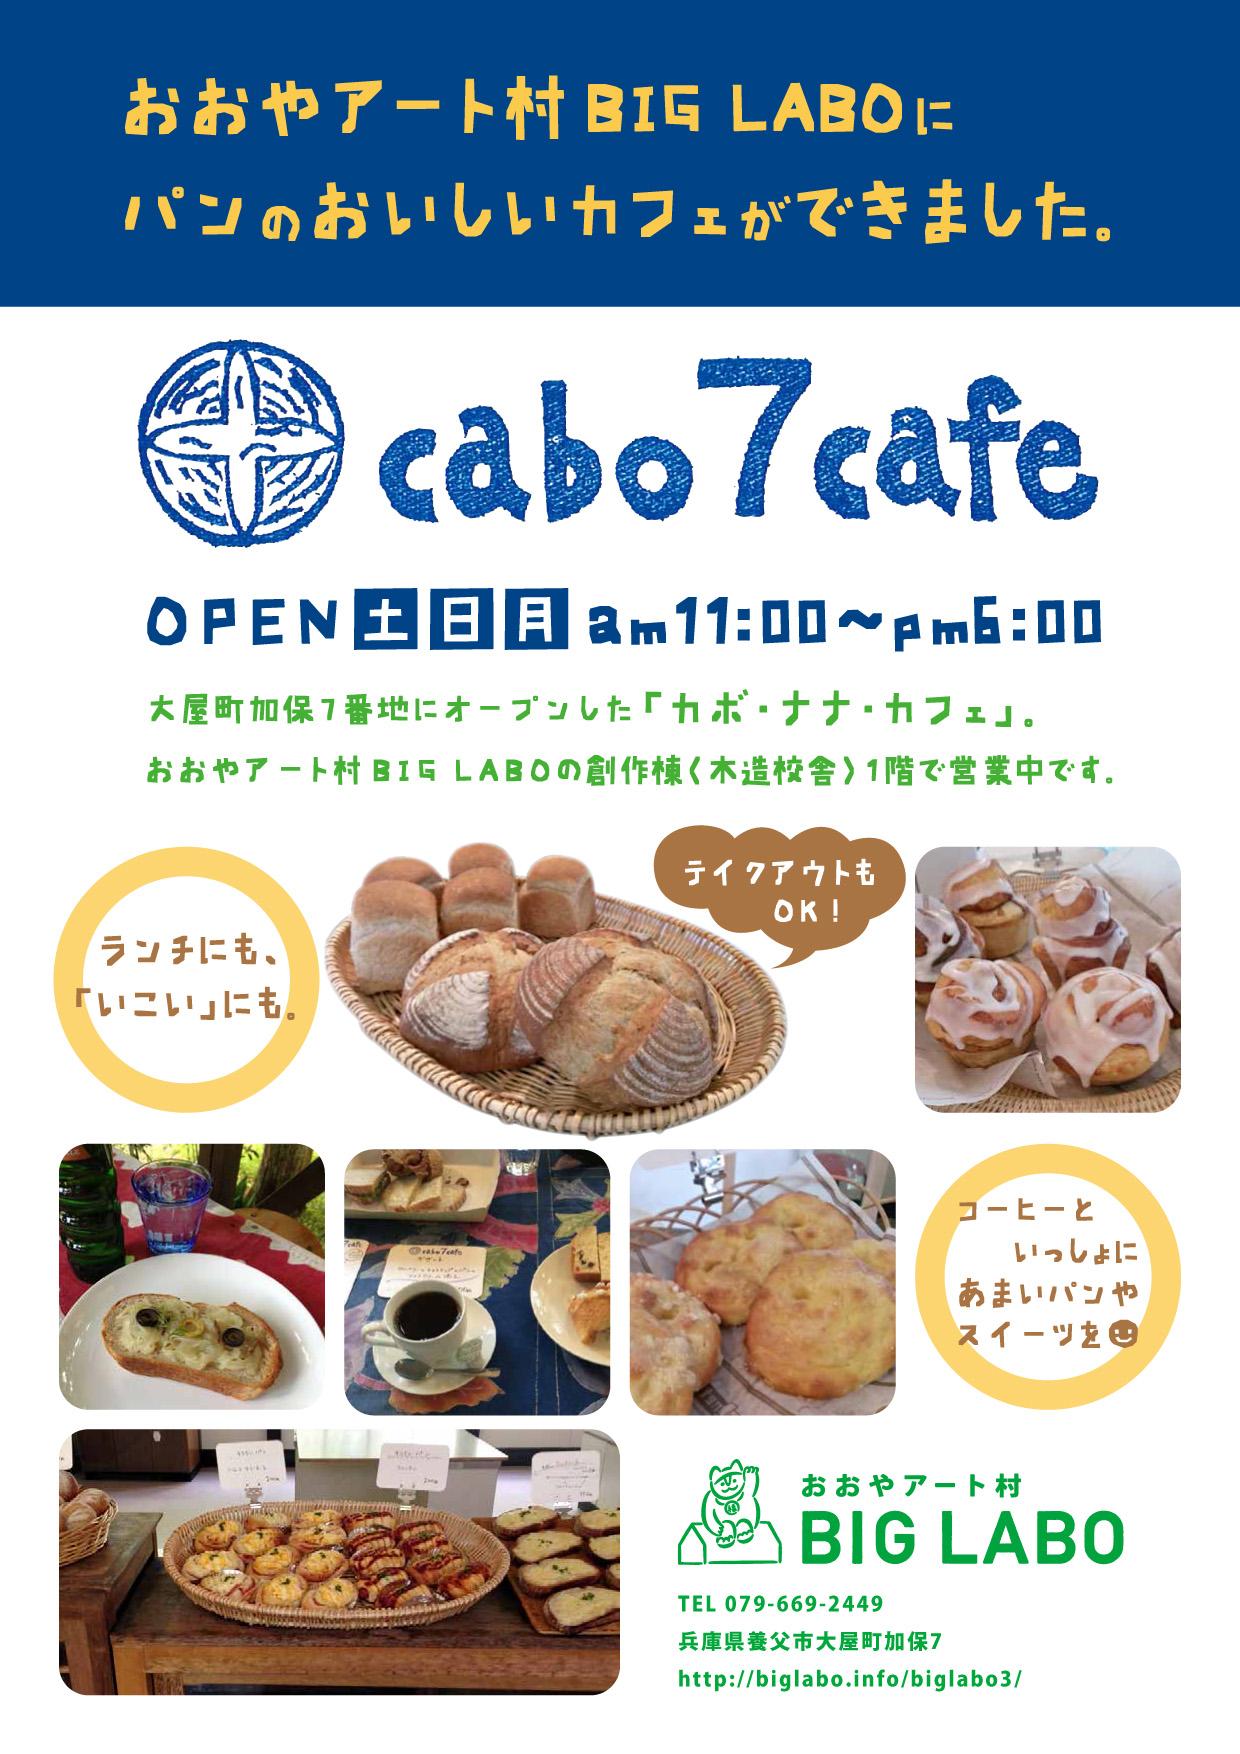 cabo7cafe 営業時間 am11:30-pm5:00です。